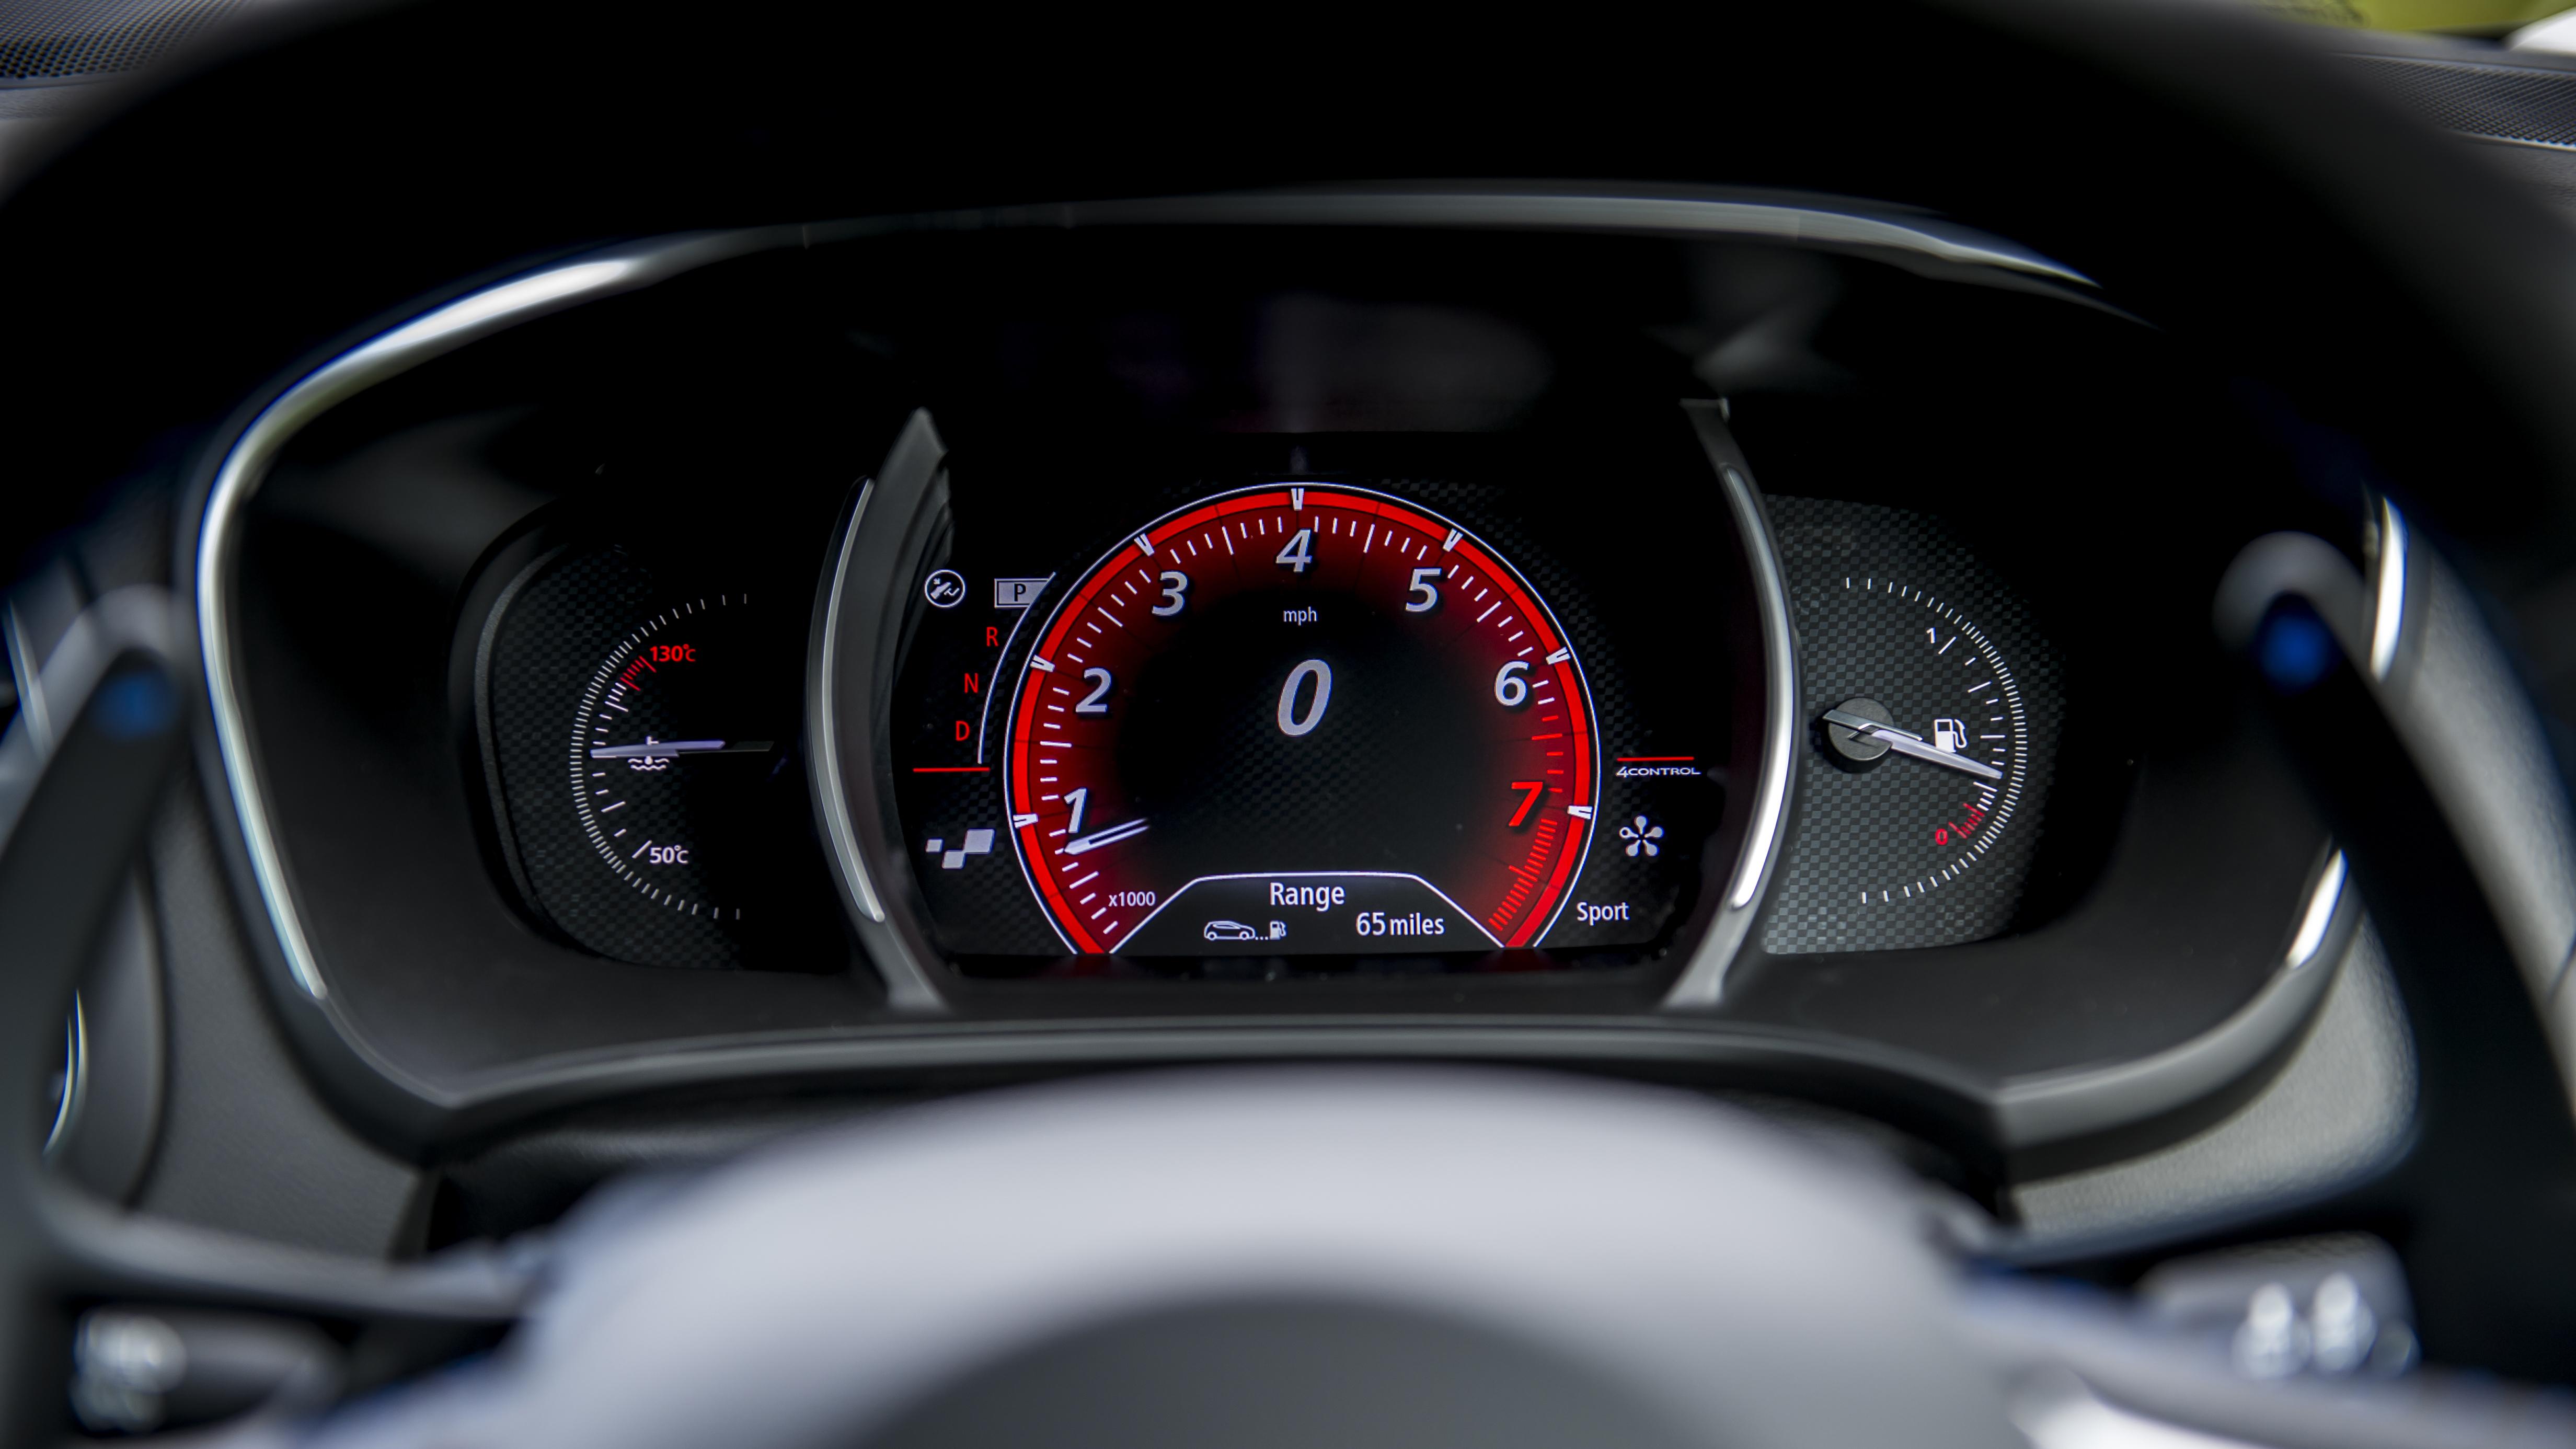 2016 Renault Mégane GT review: Clever tech, four-wheel steering, va